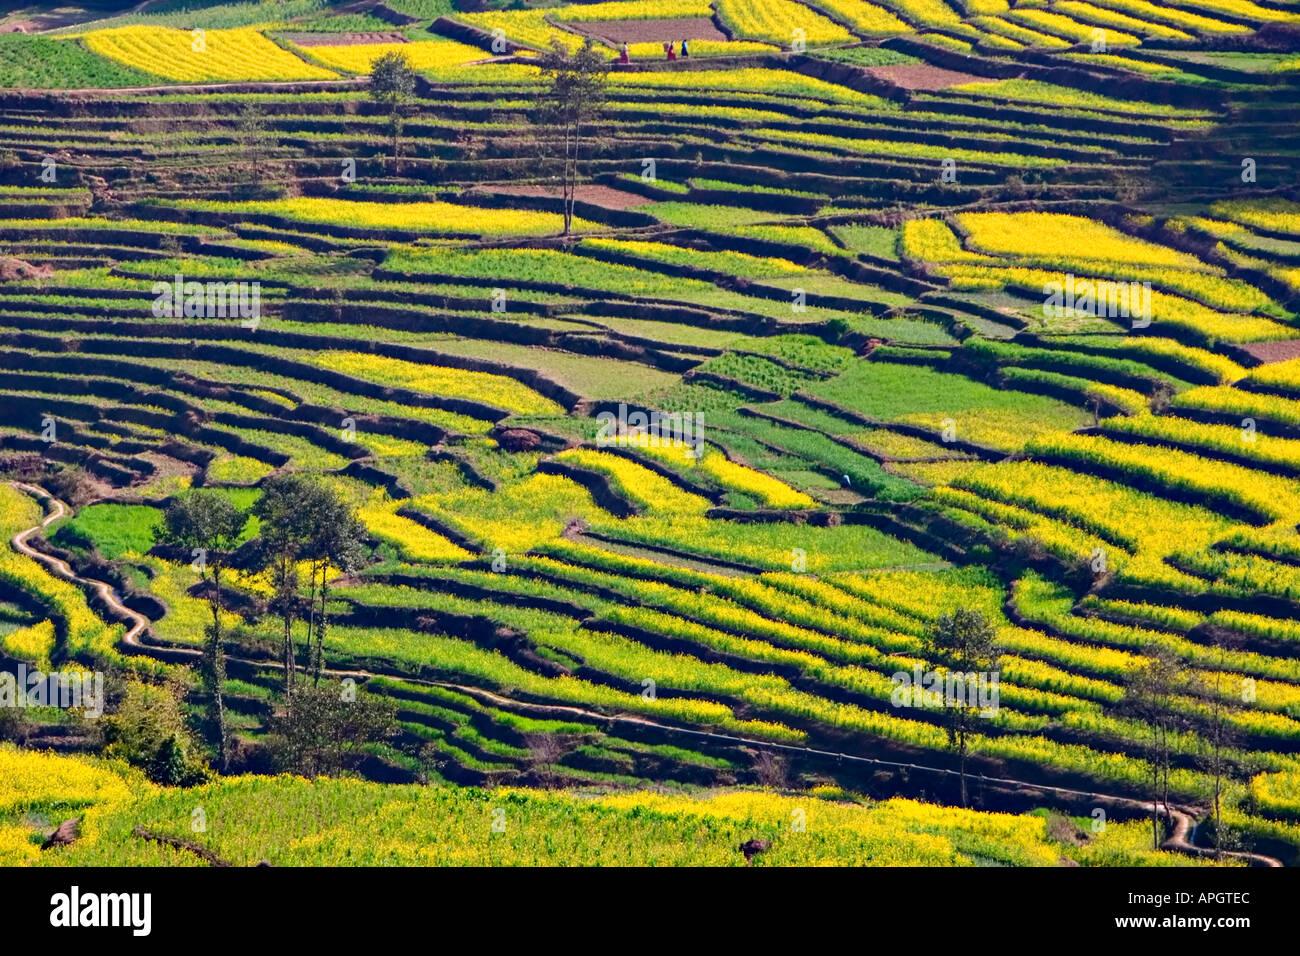 Terraced rice paddies in the Kathmandu valley Nepal - Stock Image